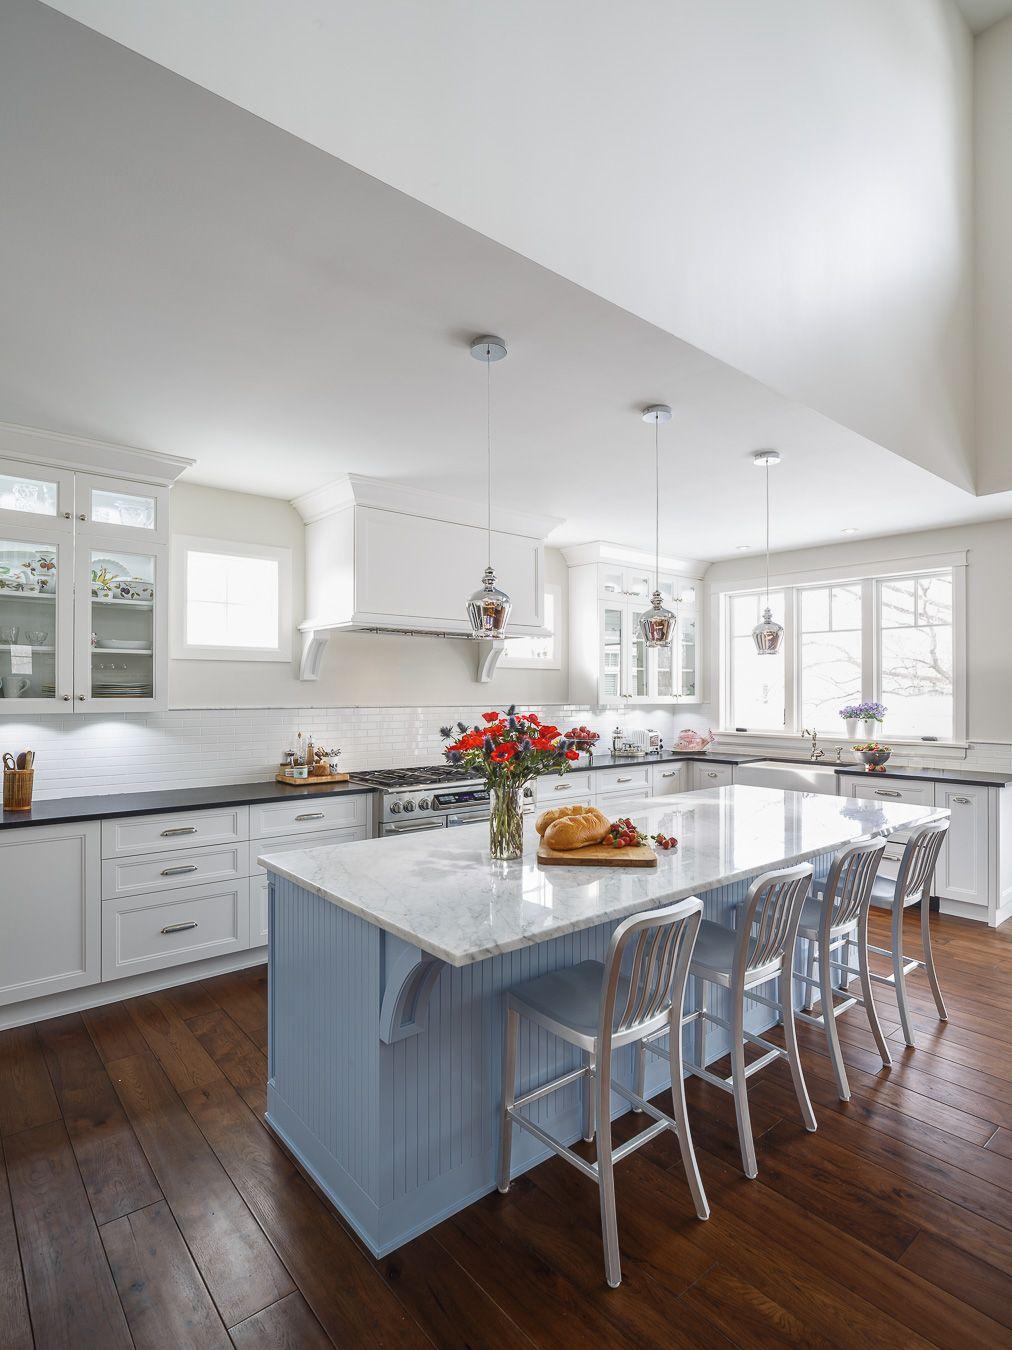 Tradtioanal White Kitchen Design Calacatta Marble Countertop Light ...